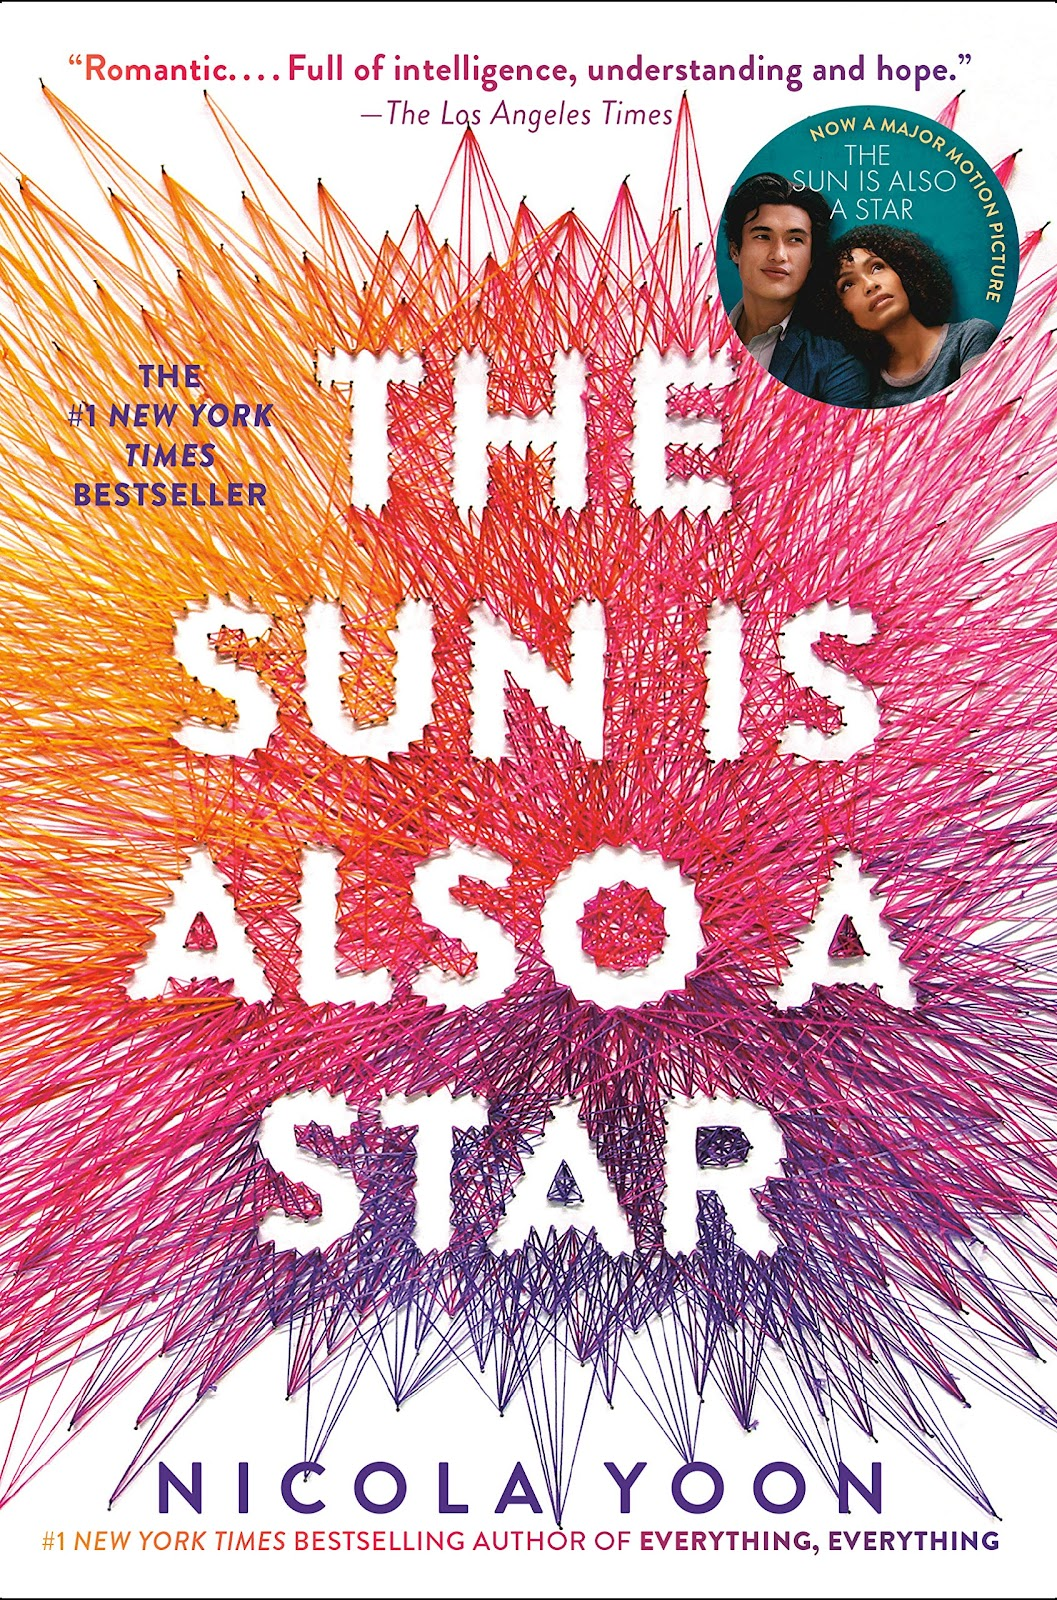 Amazon.com: The Sun Is Also a Star (Yoon, Nicola) (9780553496680 ...